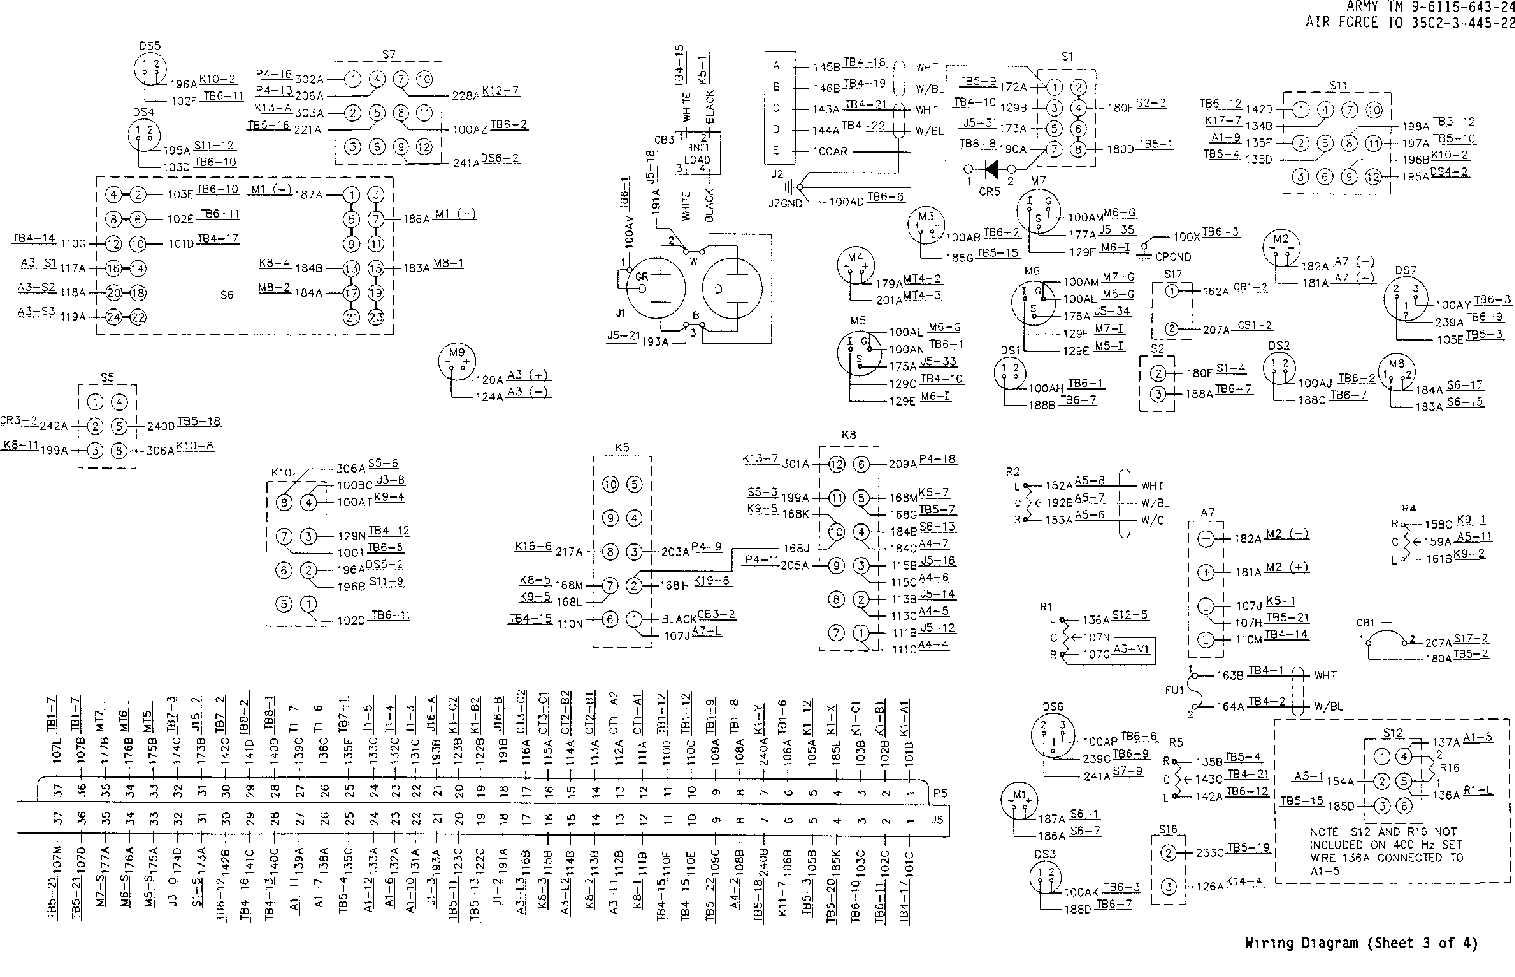 Military Generators Wiring Diagram Diagrams 6 Volt Generator Mep 803a Dc Armature Winding 3 Phase